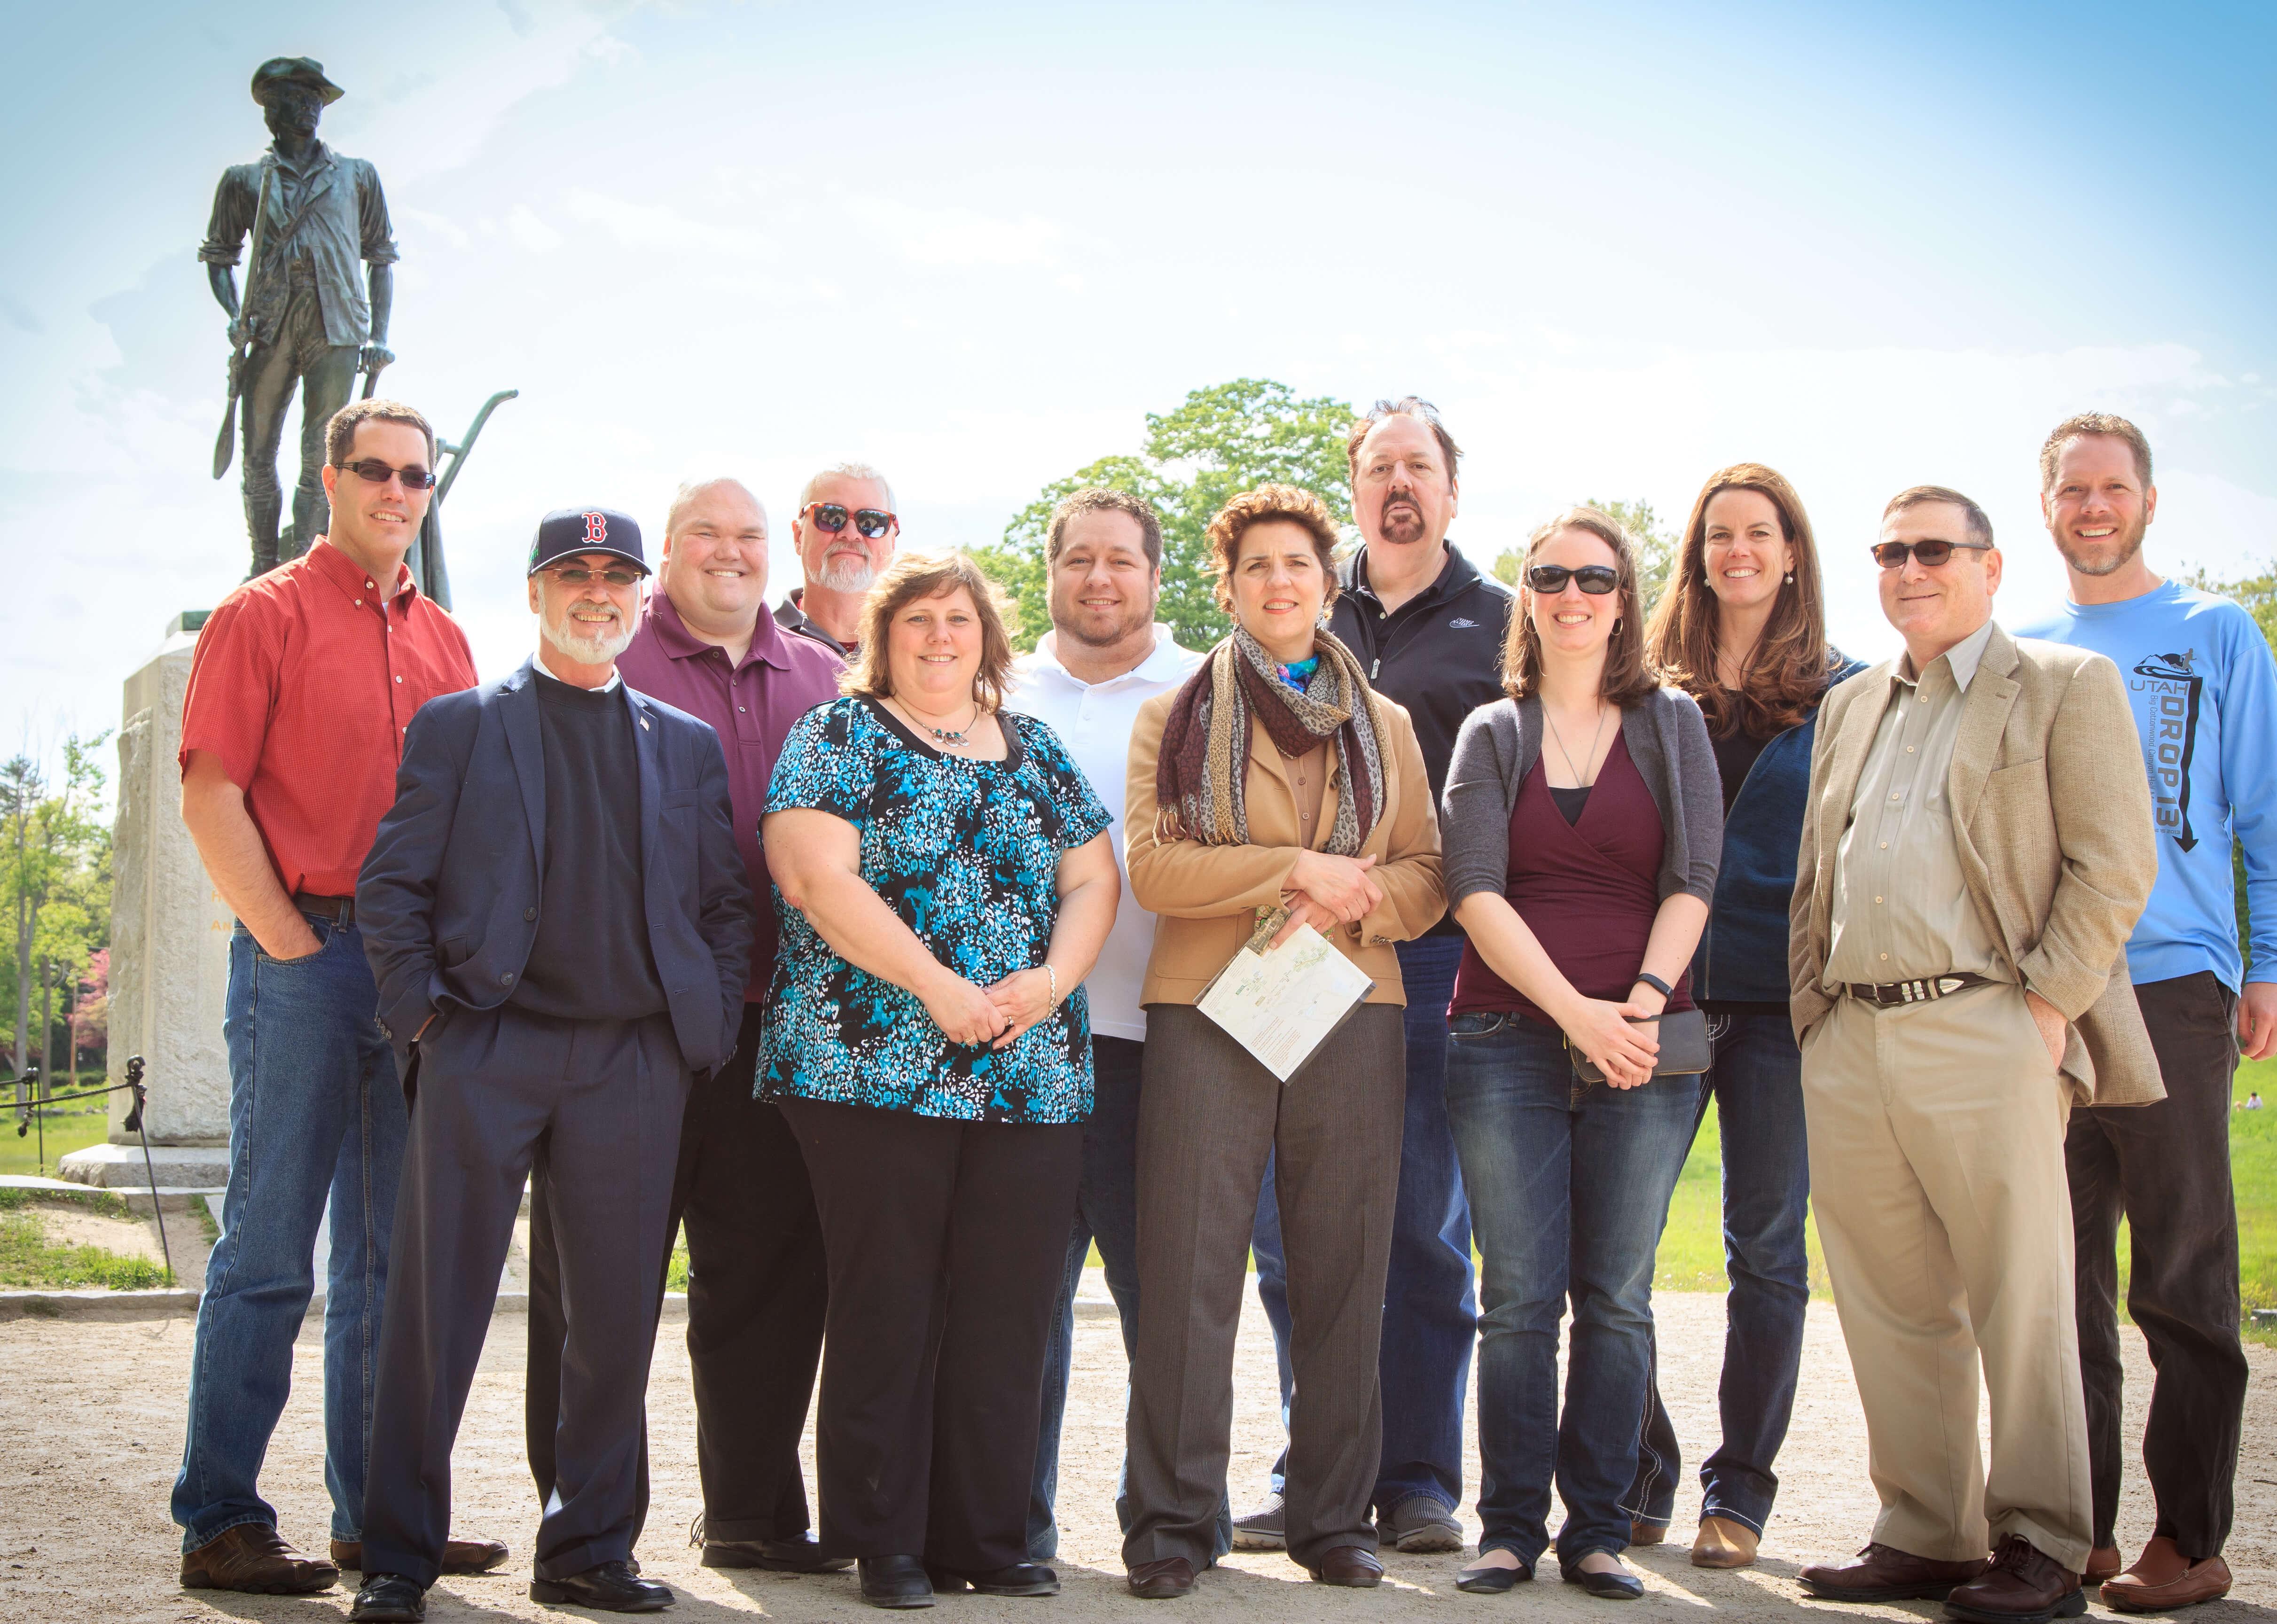 EarthSoft Managers & Concord Staff @ Concord Summit, May 19, 20, 2015 - Mat - Lorie - Chris - Maz - Diane - Rian - Janet - Dan - Emily - Tina - Mitch - Scot. Missing: Alek, John, Jürgen. Photo Courtesy of Scot Weaver